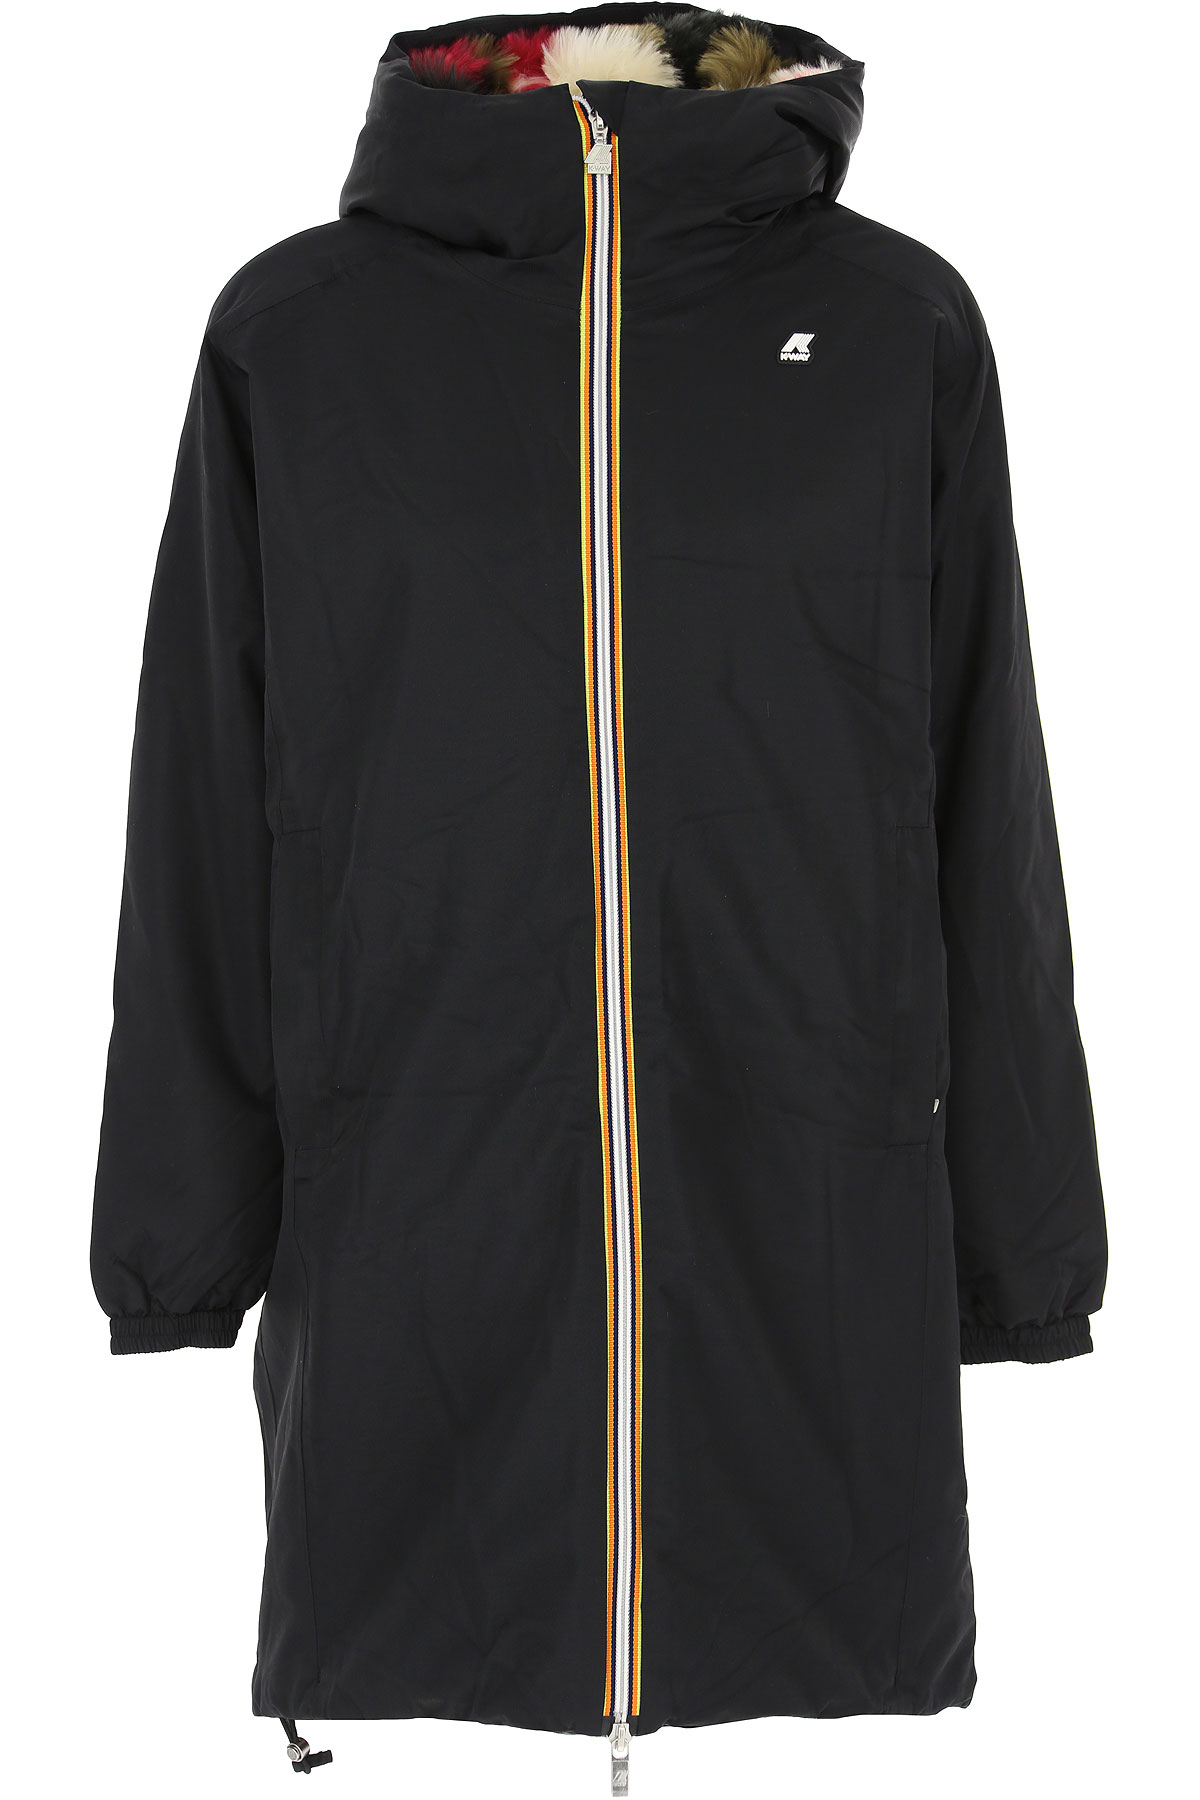 K-Way Down Jacket for Women, Puffer Ski Jacket On Sale, Black, polyestere, 2019, 44